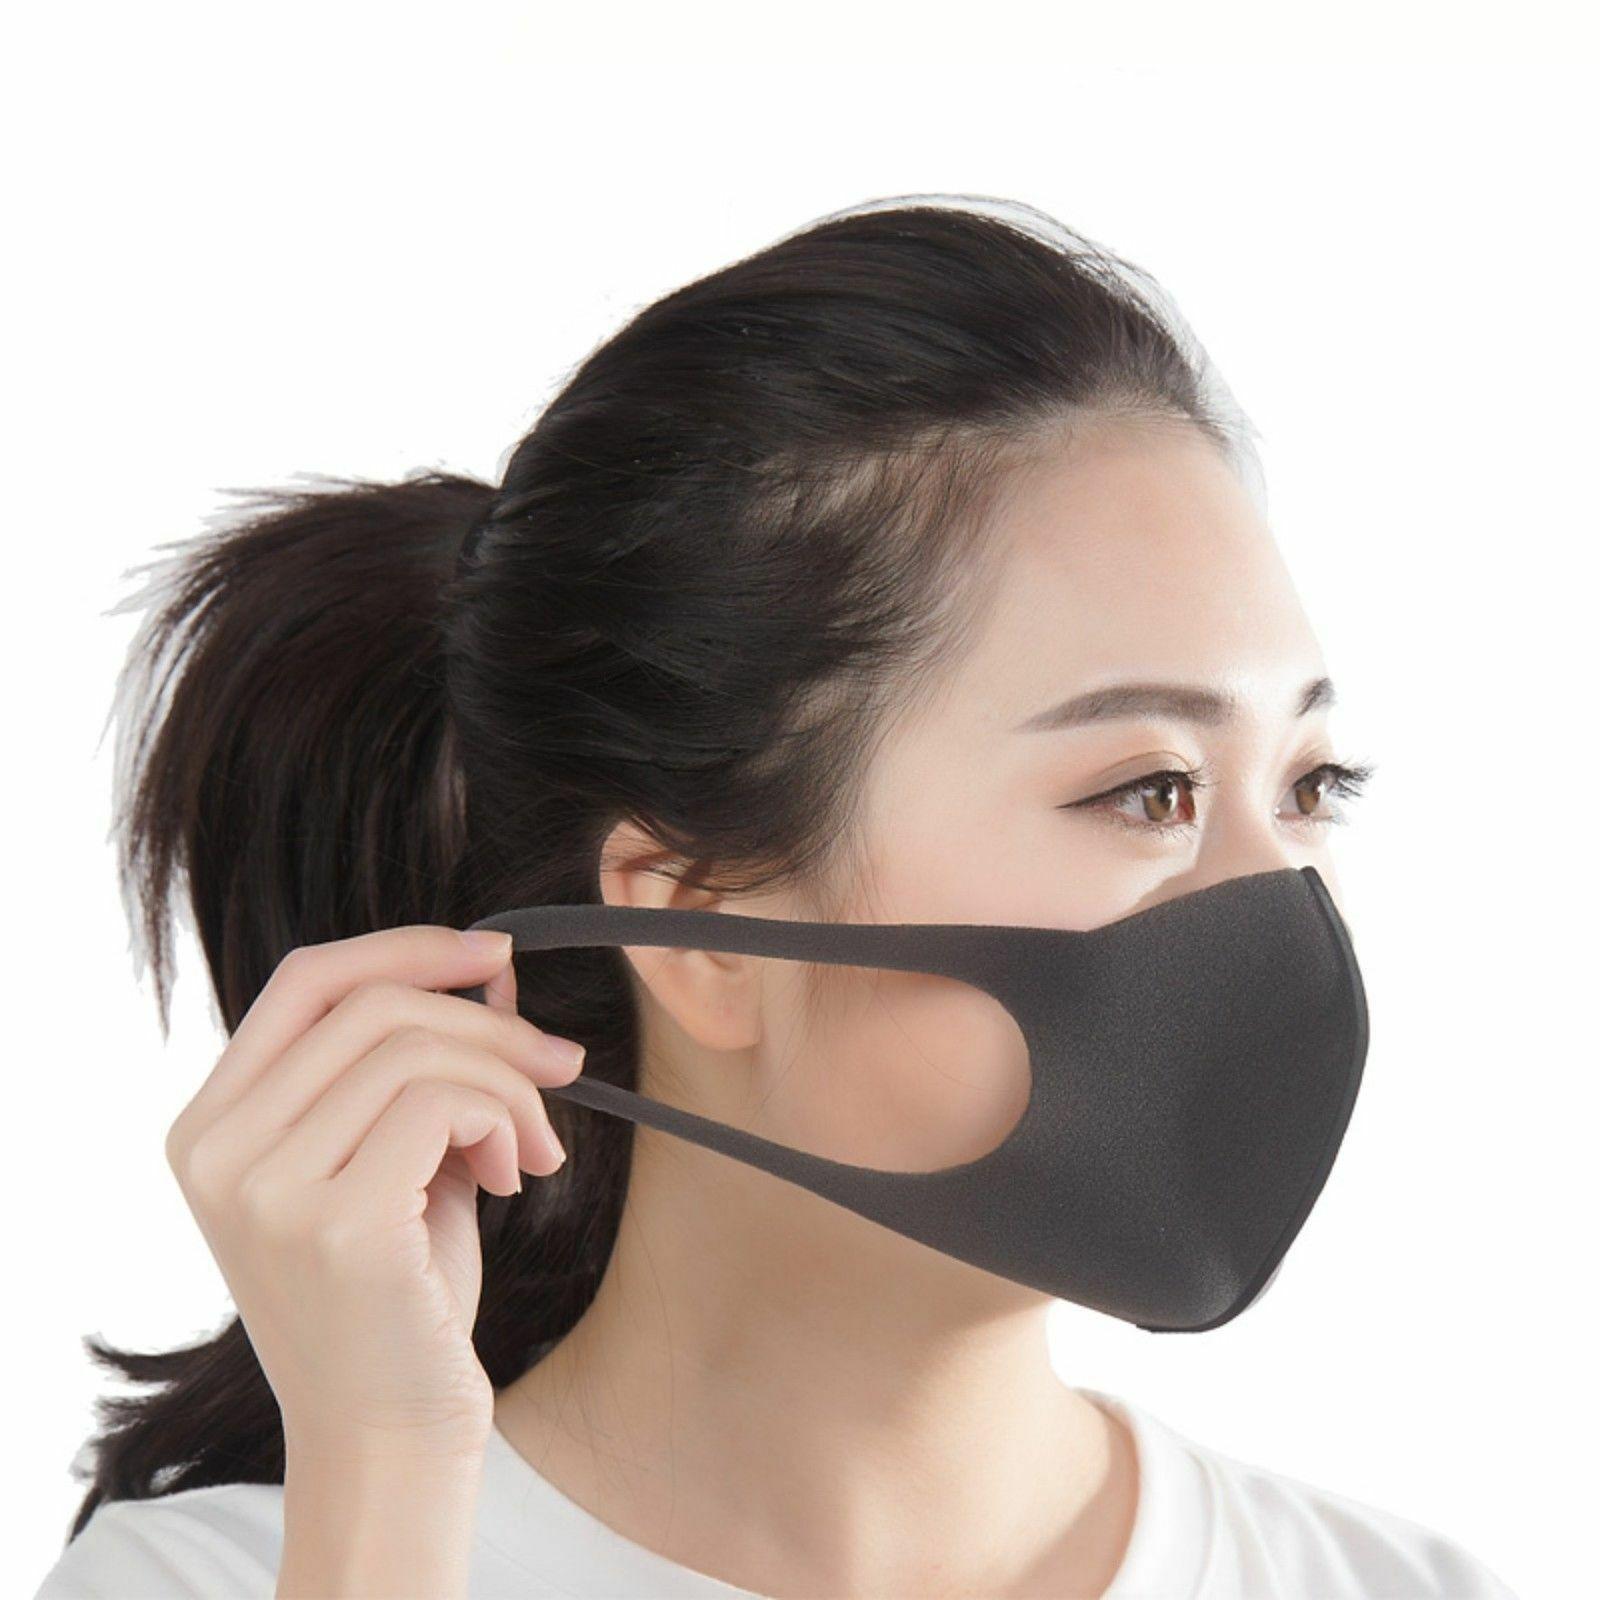 New 3/6/10/60/120pcs Regular Size Black Pitta Mask Dark Gray Japan Anti-Pollution/Dust Face Mask Dropshipping